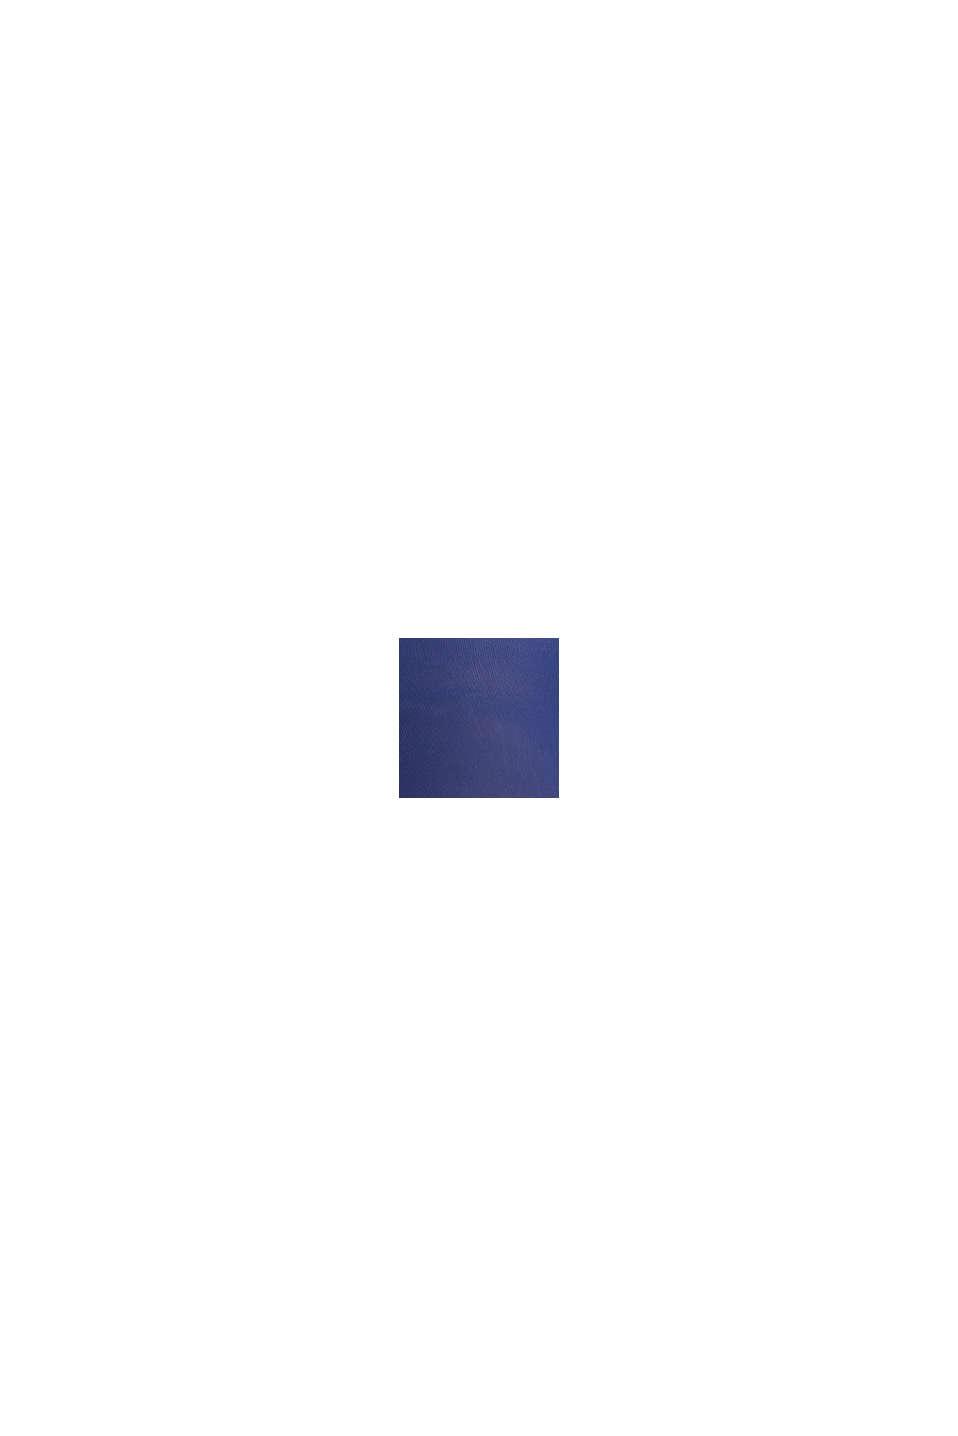 Leggings semiopacos, 50 DEN, DEEP BLUE, swatch